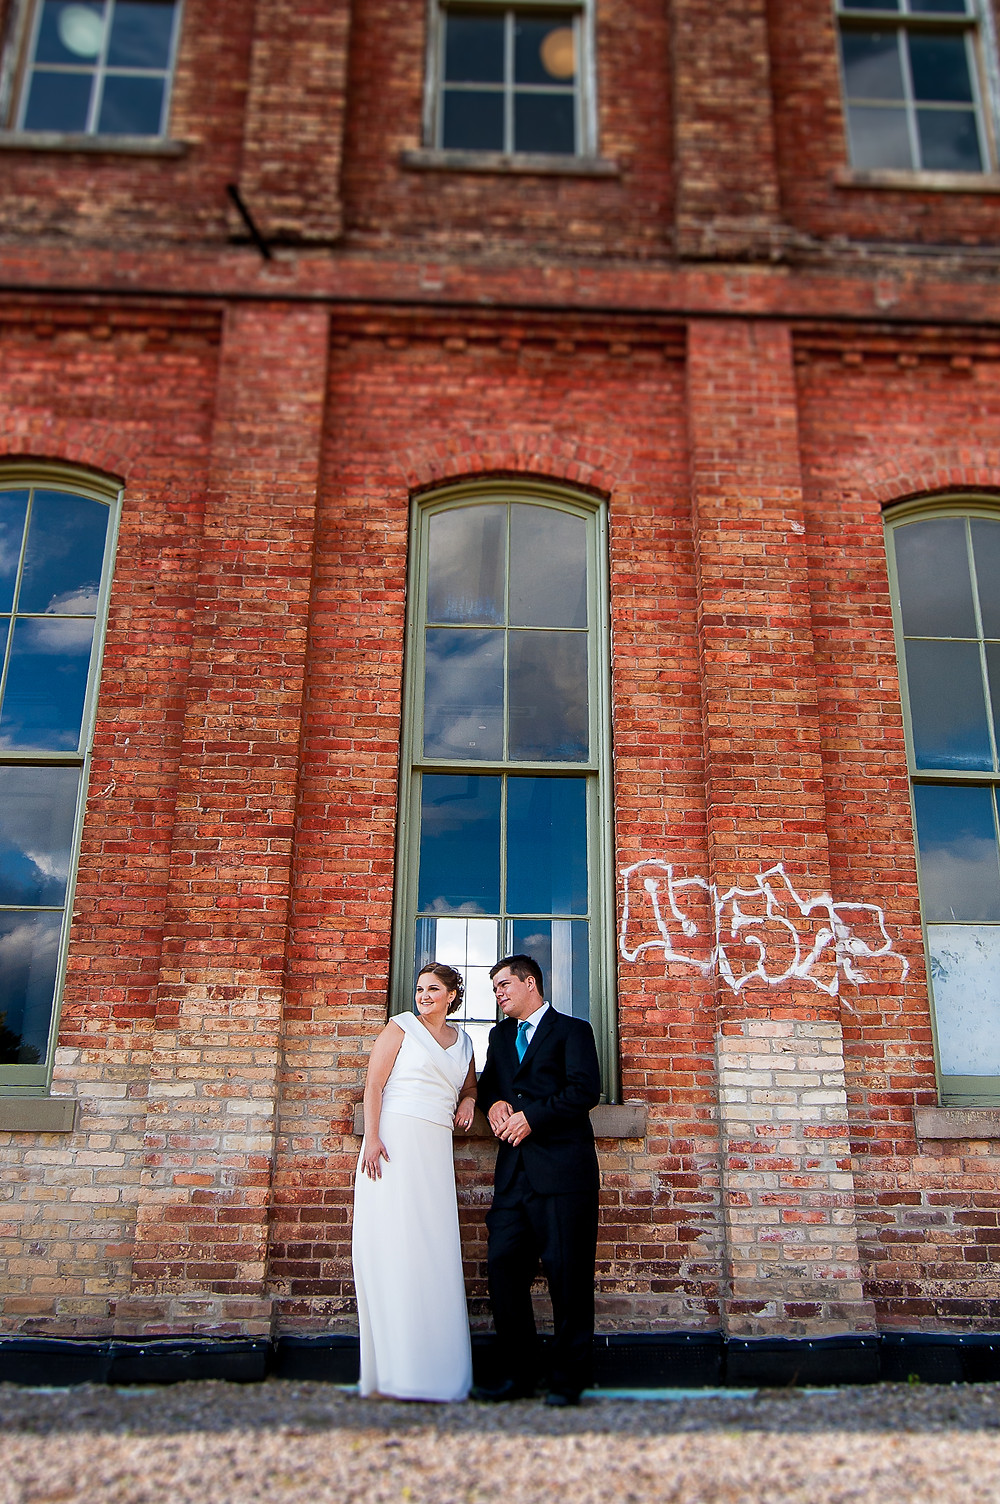 St. Thomas train station wedding photos